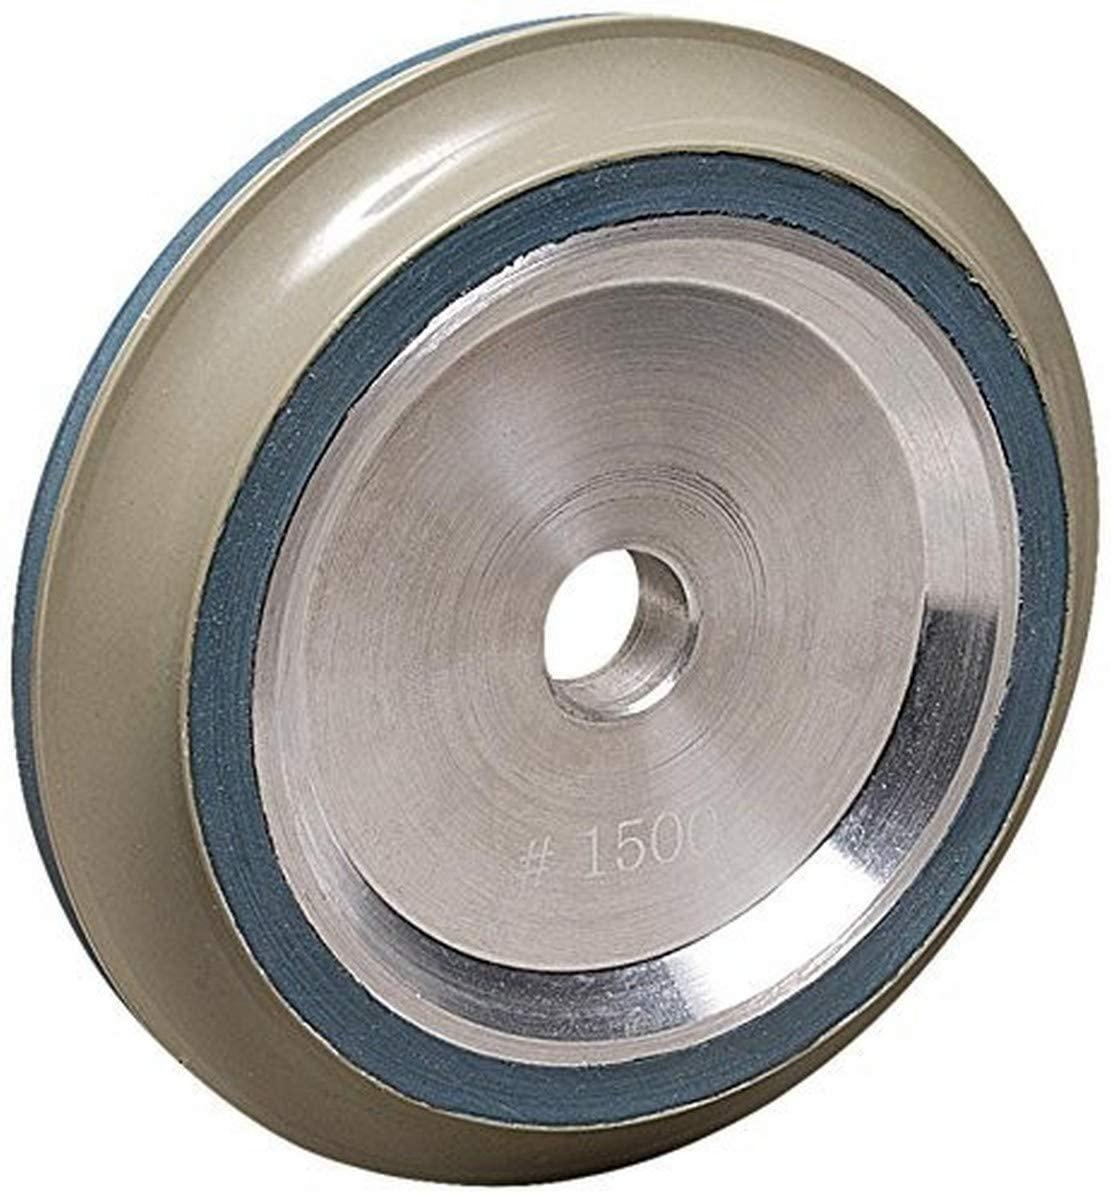 MK Diamond 166090 3500 Grit Resin Bond B-Profile Wheel, DX 15mm Radius